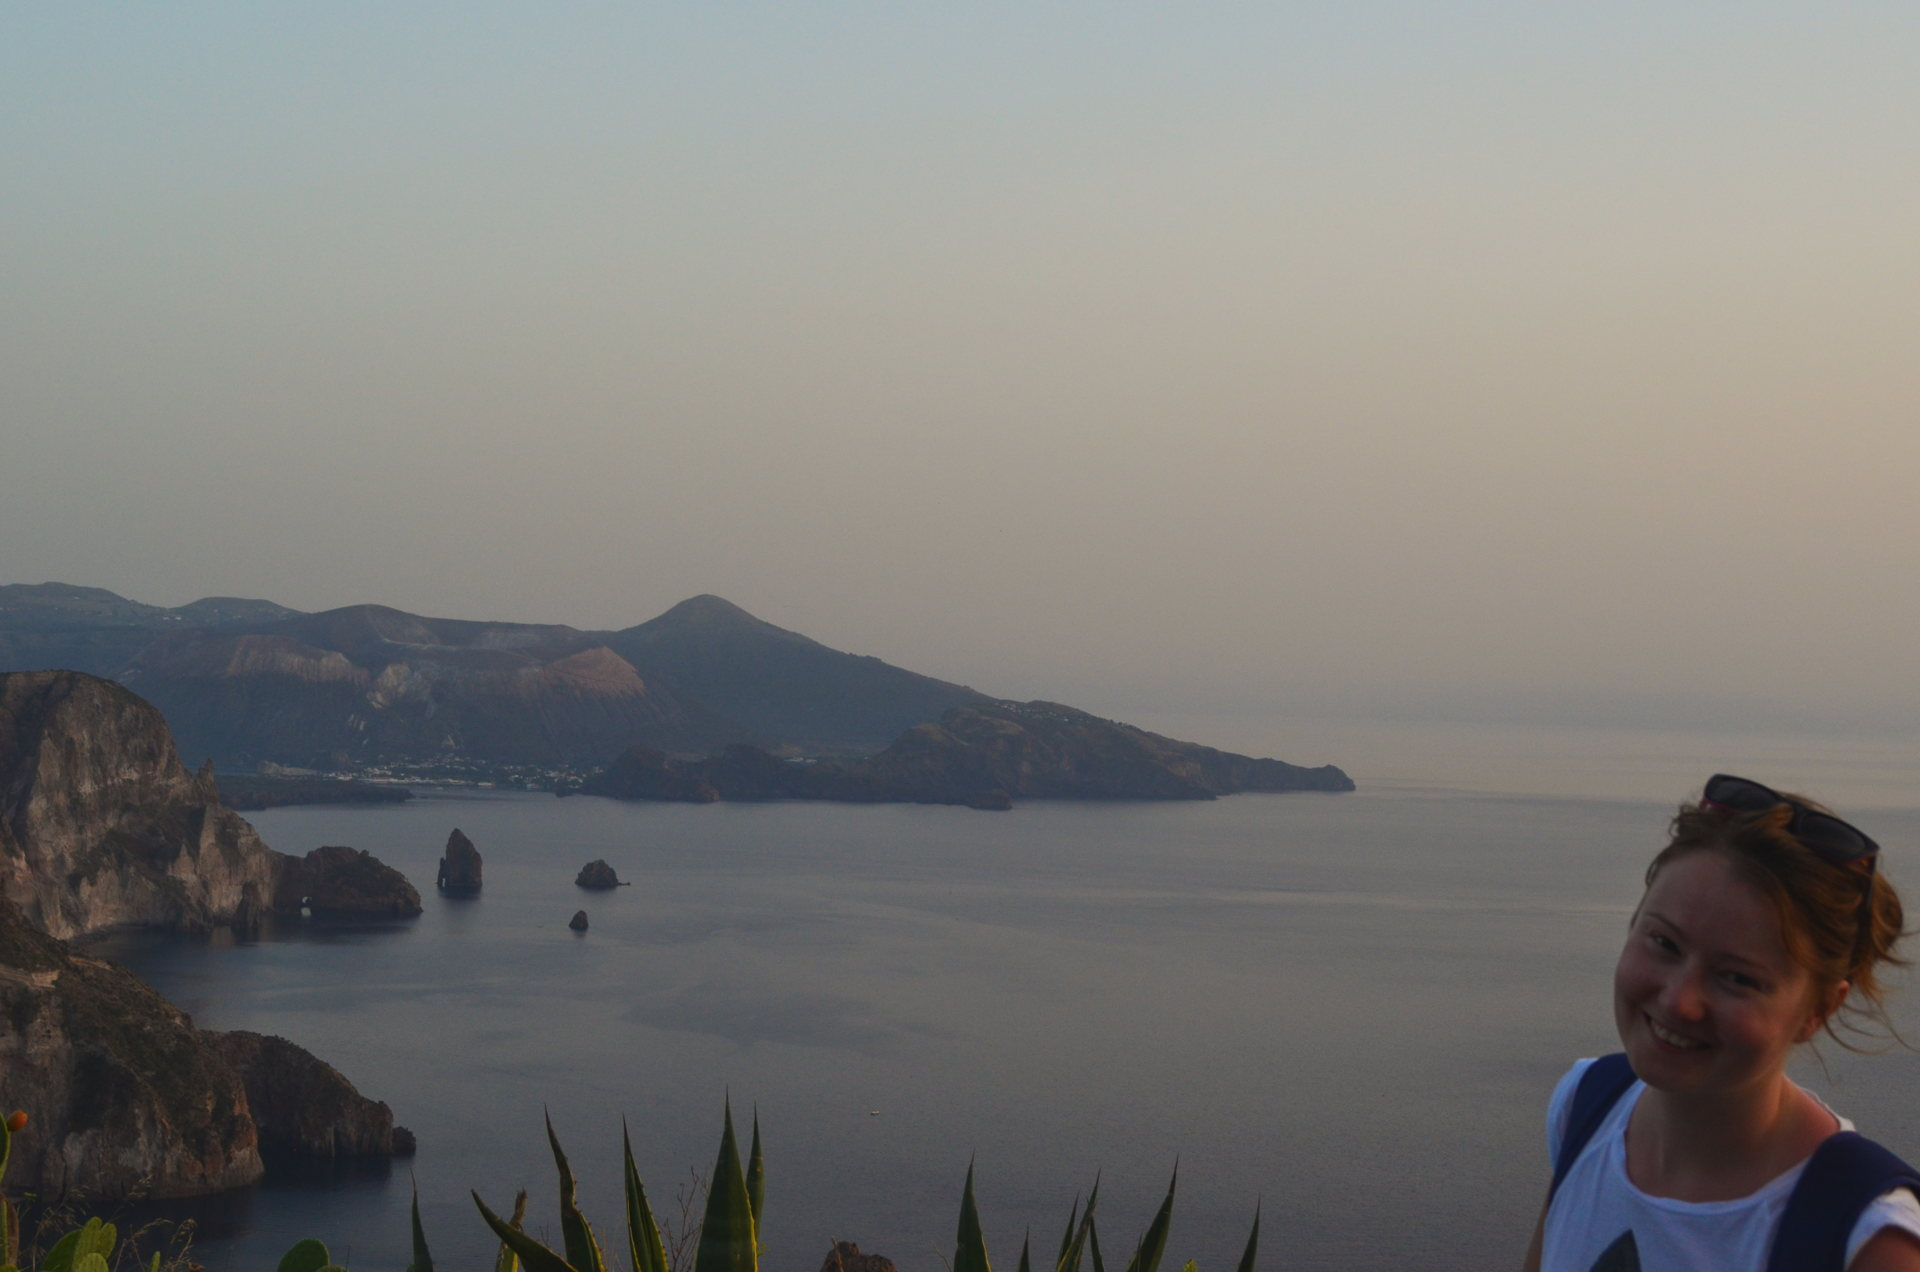 lipari, Belvedere Quattrocchi, lipari best viewpoint, aeolian islands travel guide, travel around aeolian islands, aeolian islands travel blog, what to do in sicily, best places in sicily, sicily, aeolian islands